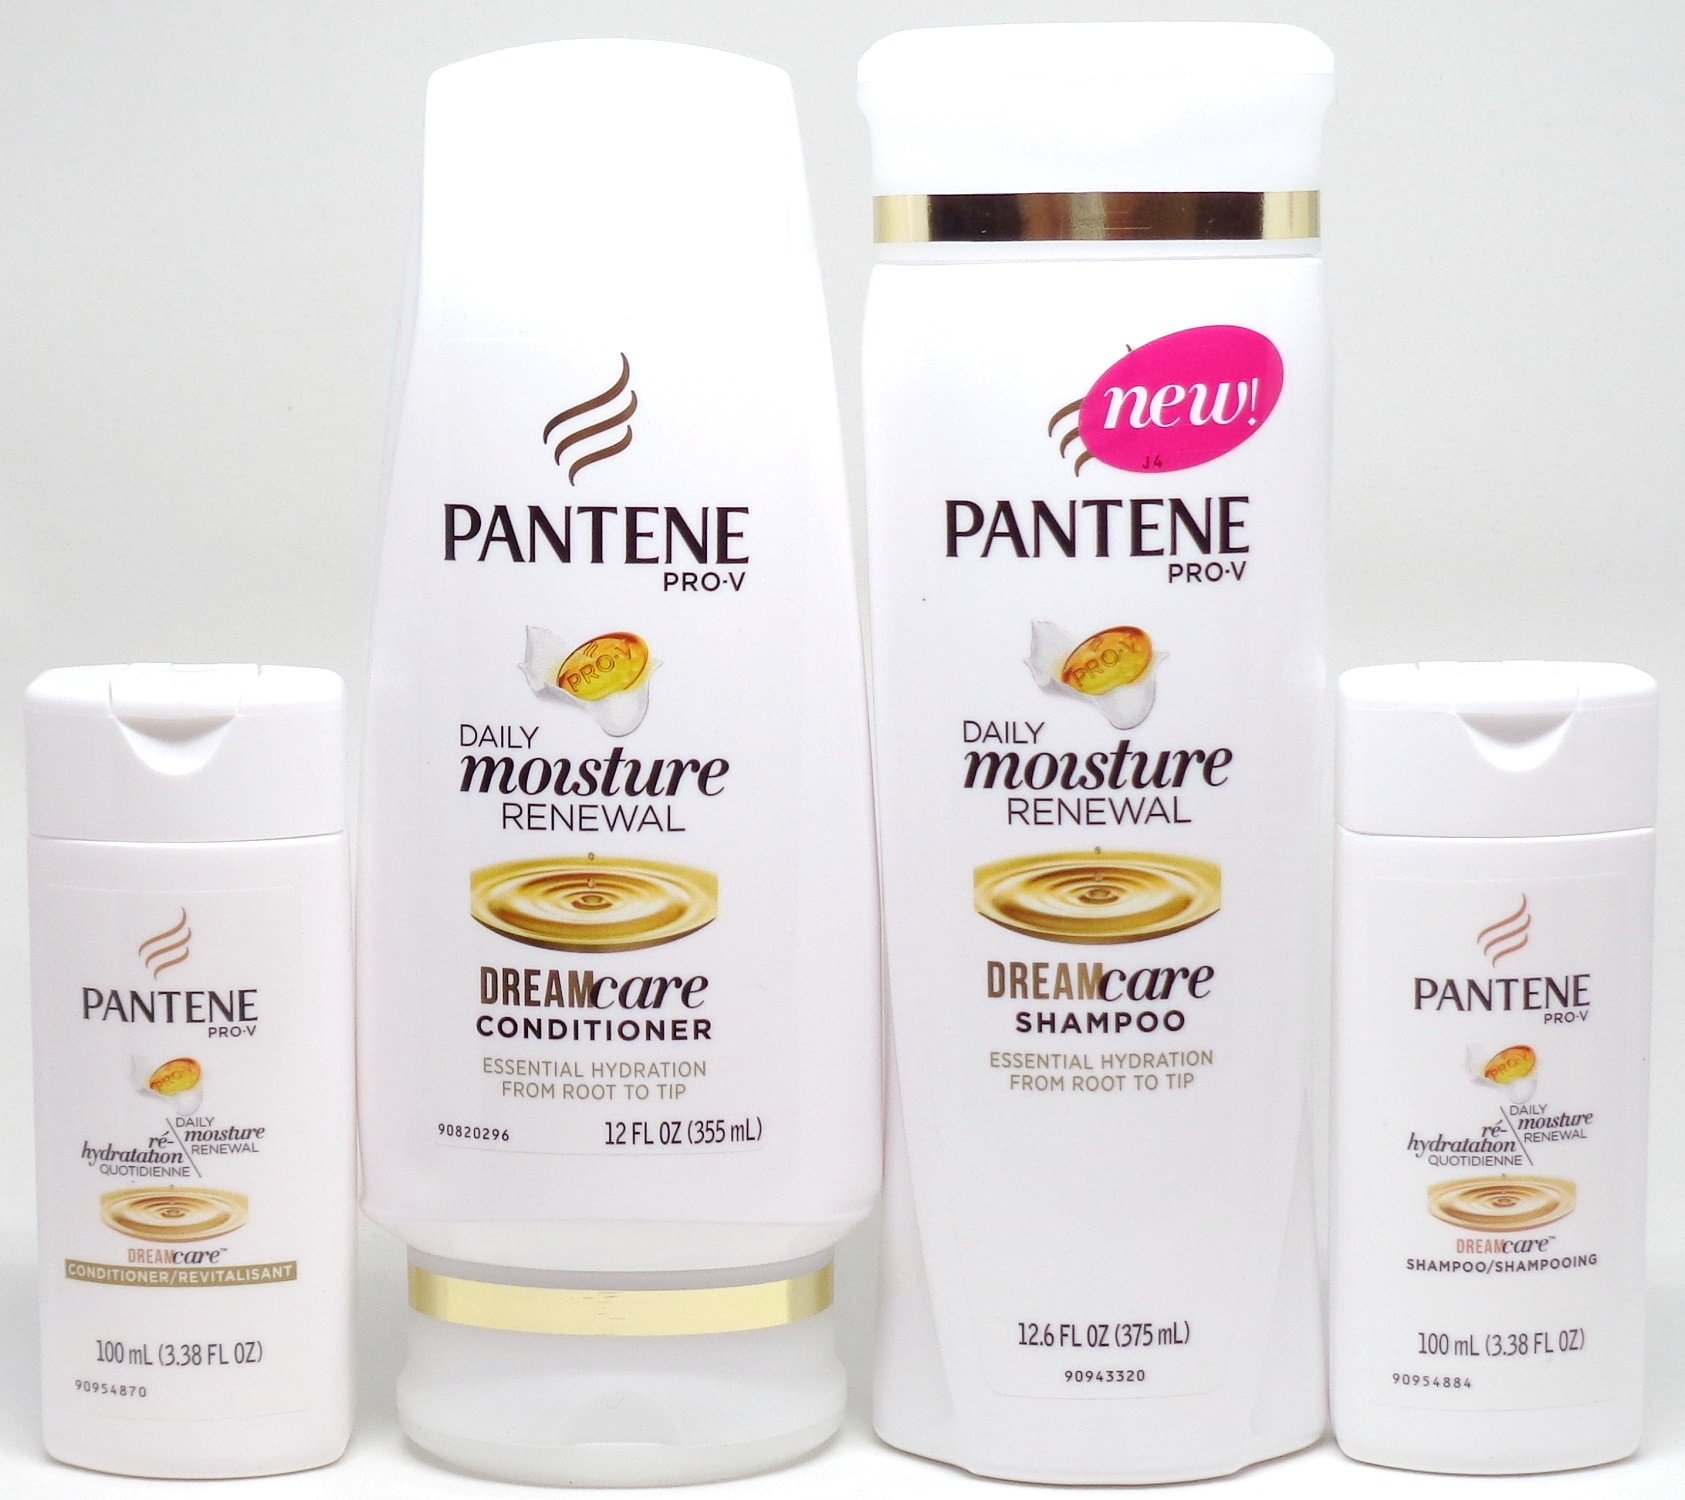 Pantene Daily Moisture Renewal Dream Care, Duo set Shampoo 12.6 Ounce + Conditioner, 12 Ounce, Plus Bonus